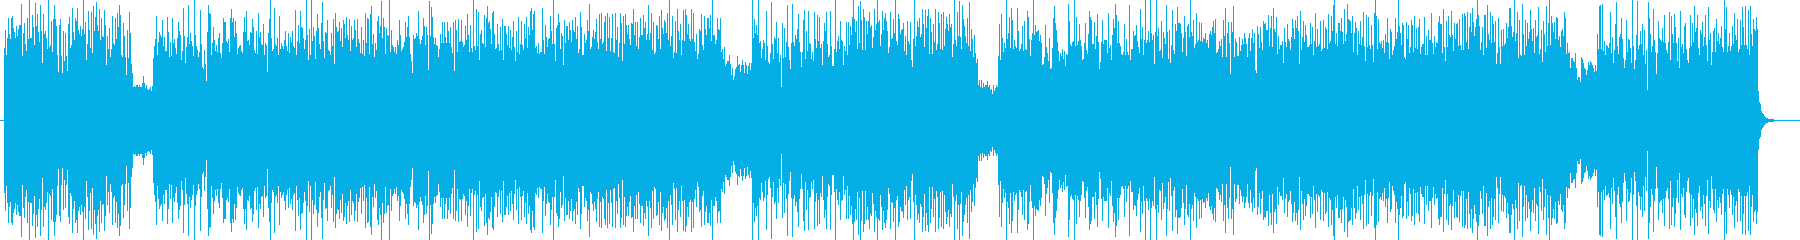 「HR/HM」「METAL」BGM271の再生済みの波形